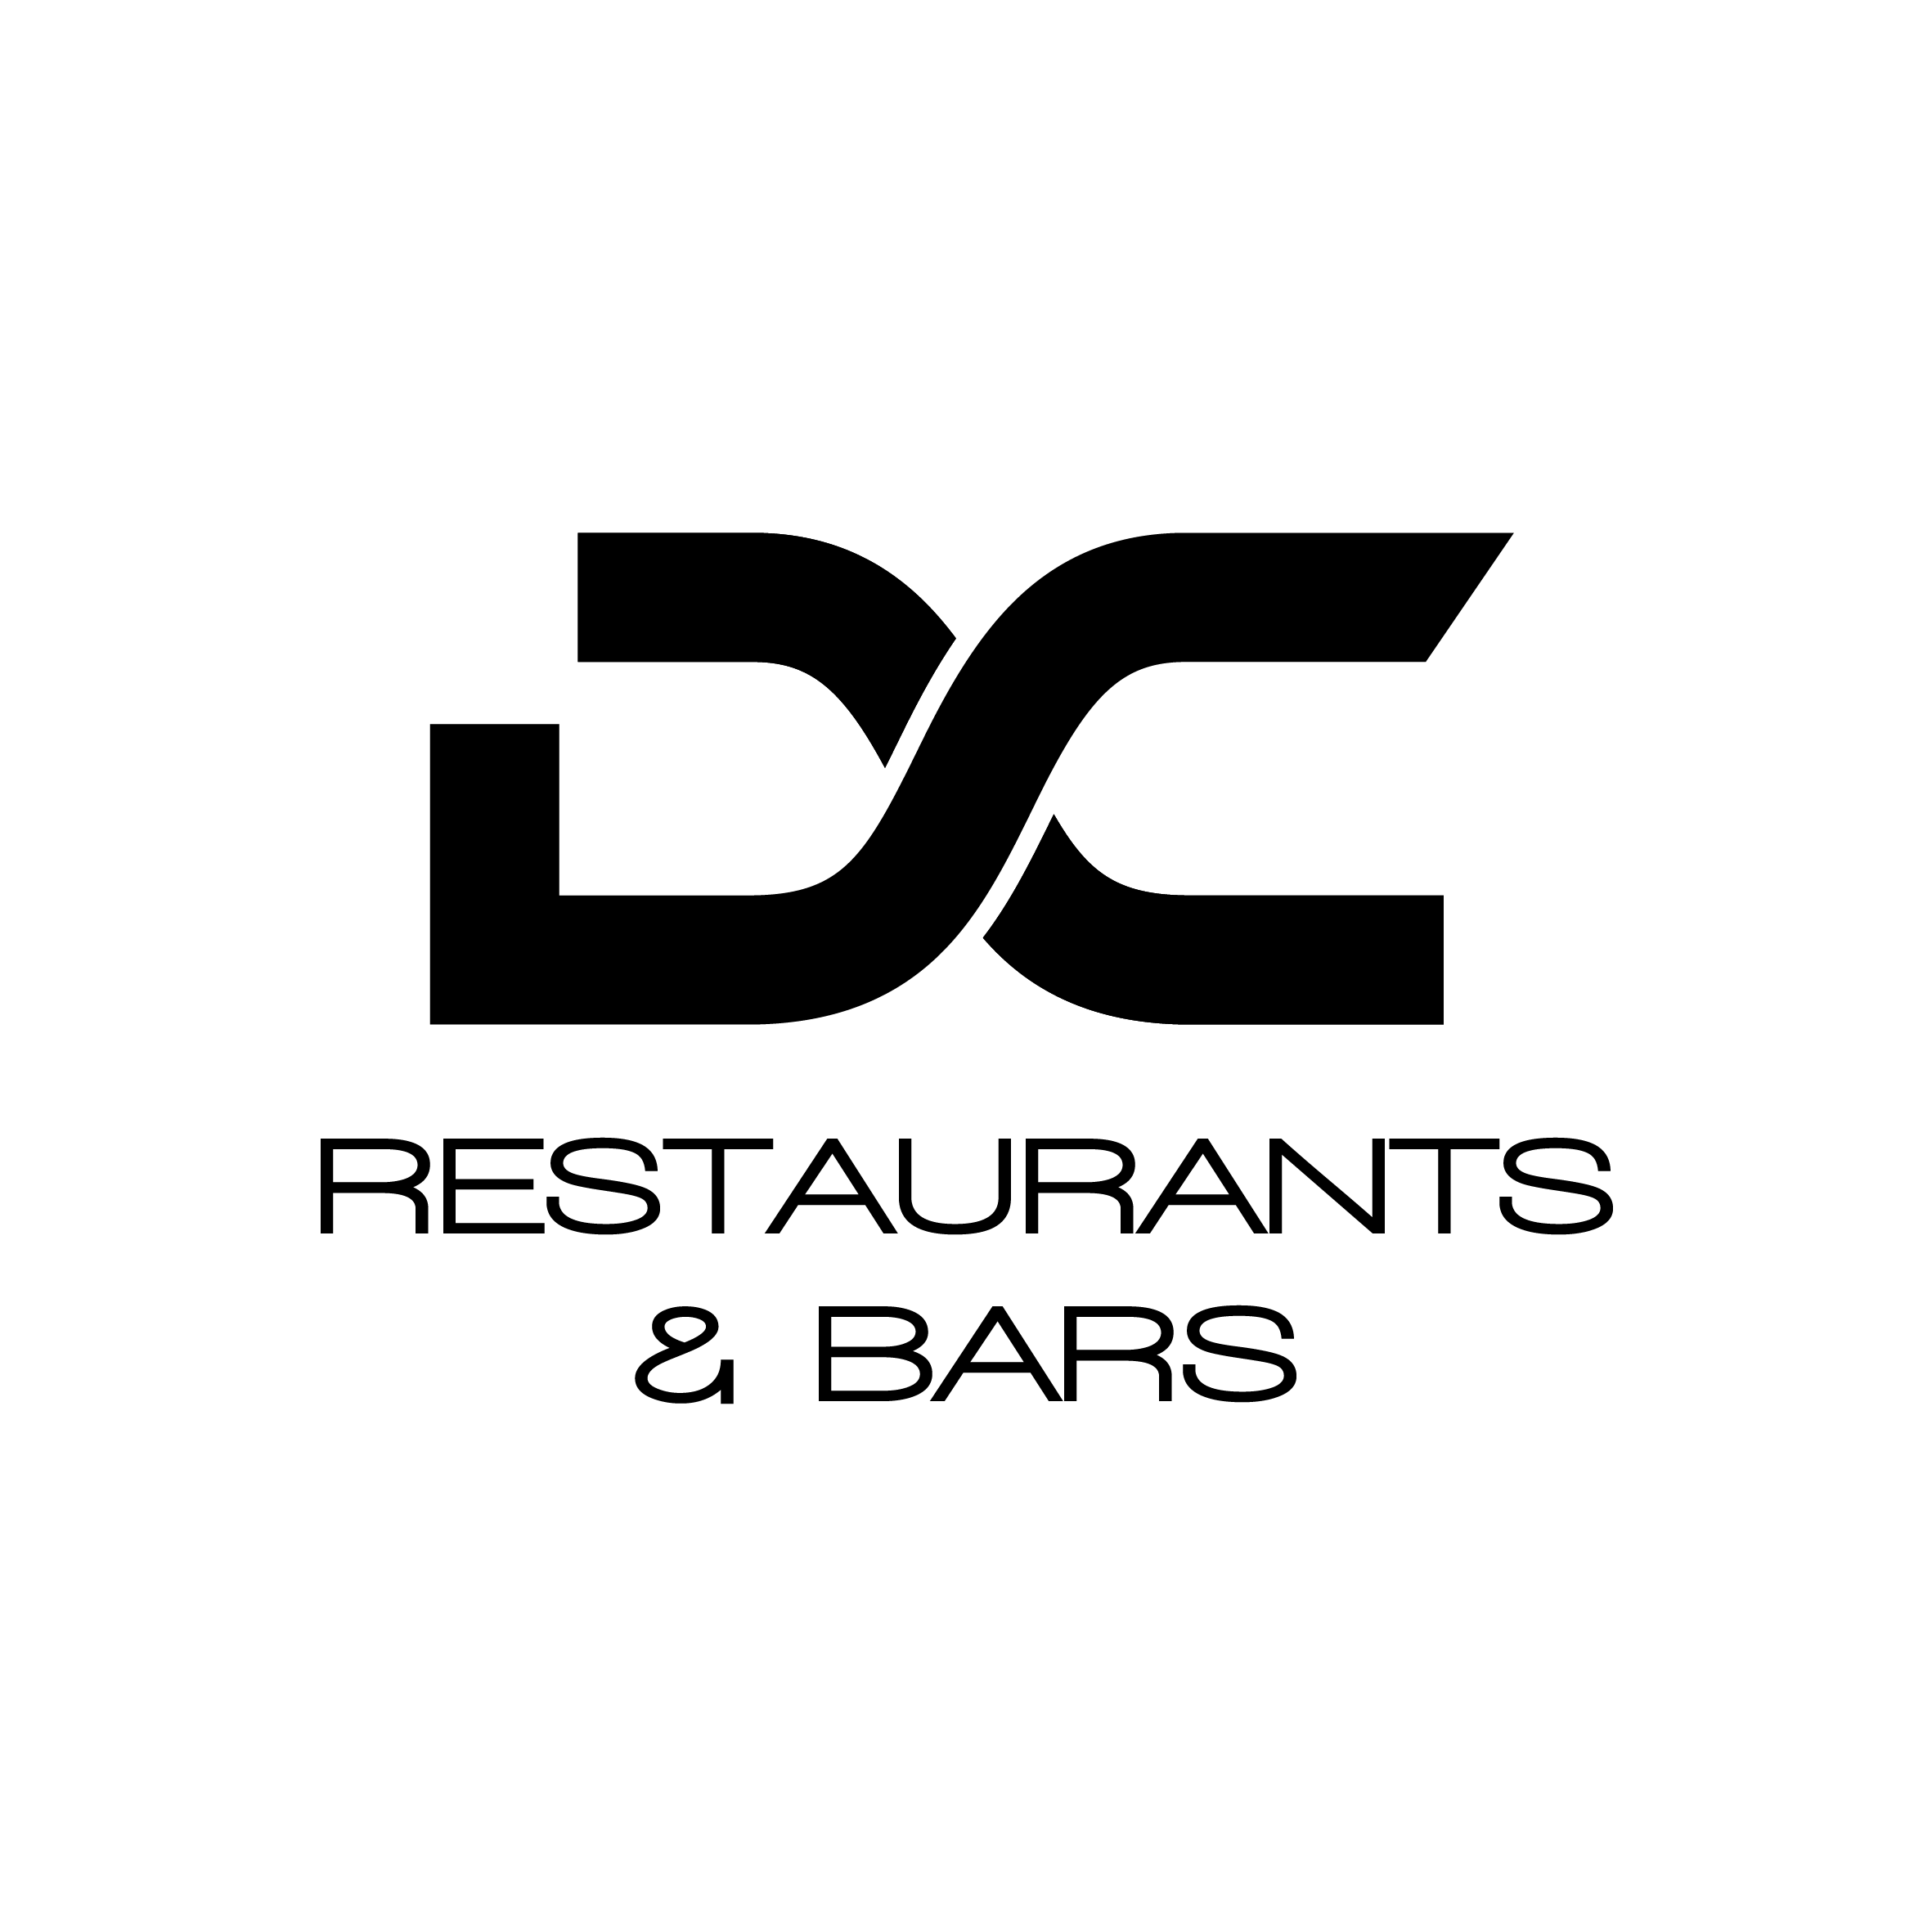 DC_Logos_restaurants and bars.png